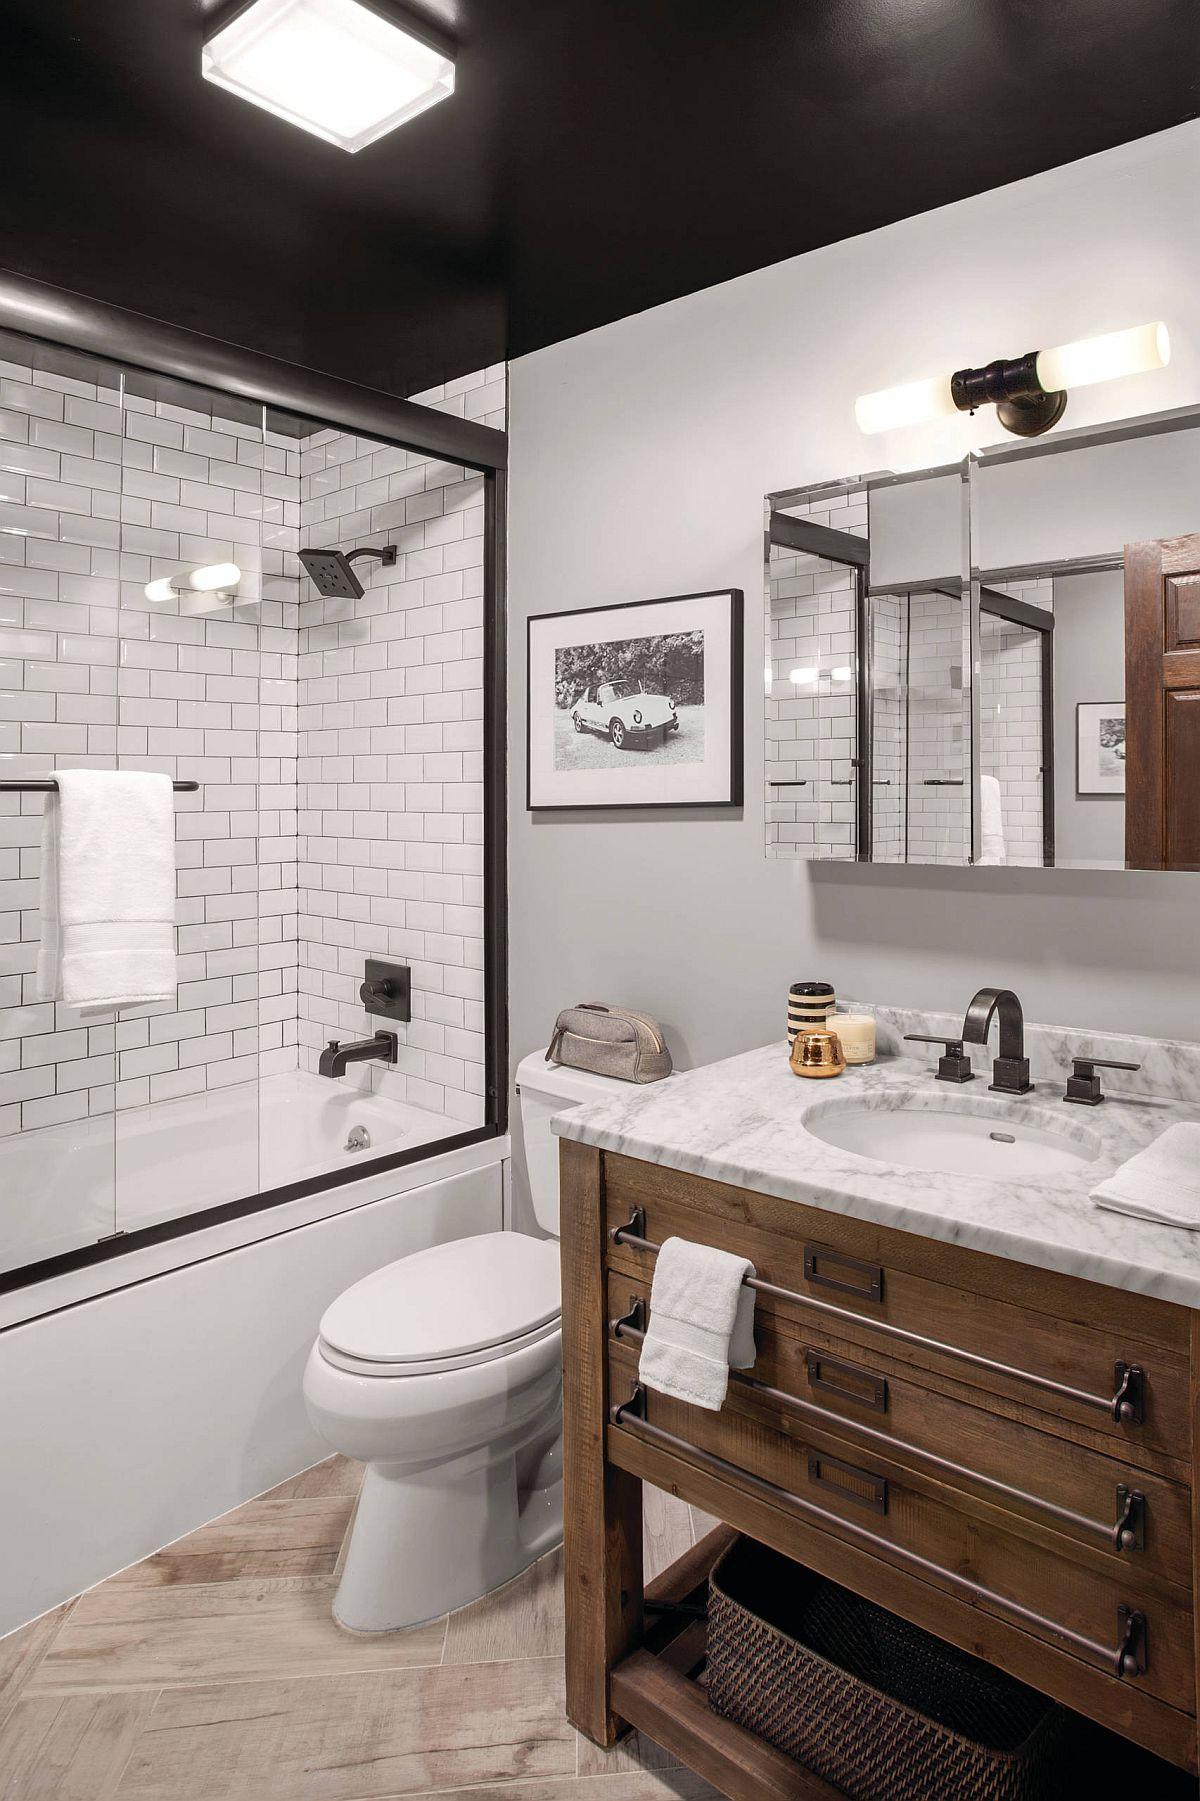 Small Rustic Bathrooms: 15 Fabulous Ideas for Everyone on Small Apartment Bathroom Ideas  id=25272